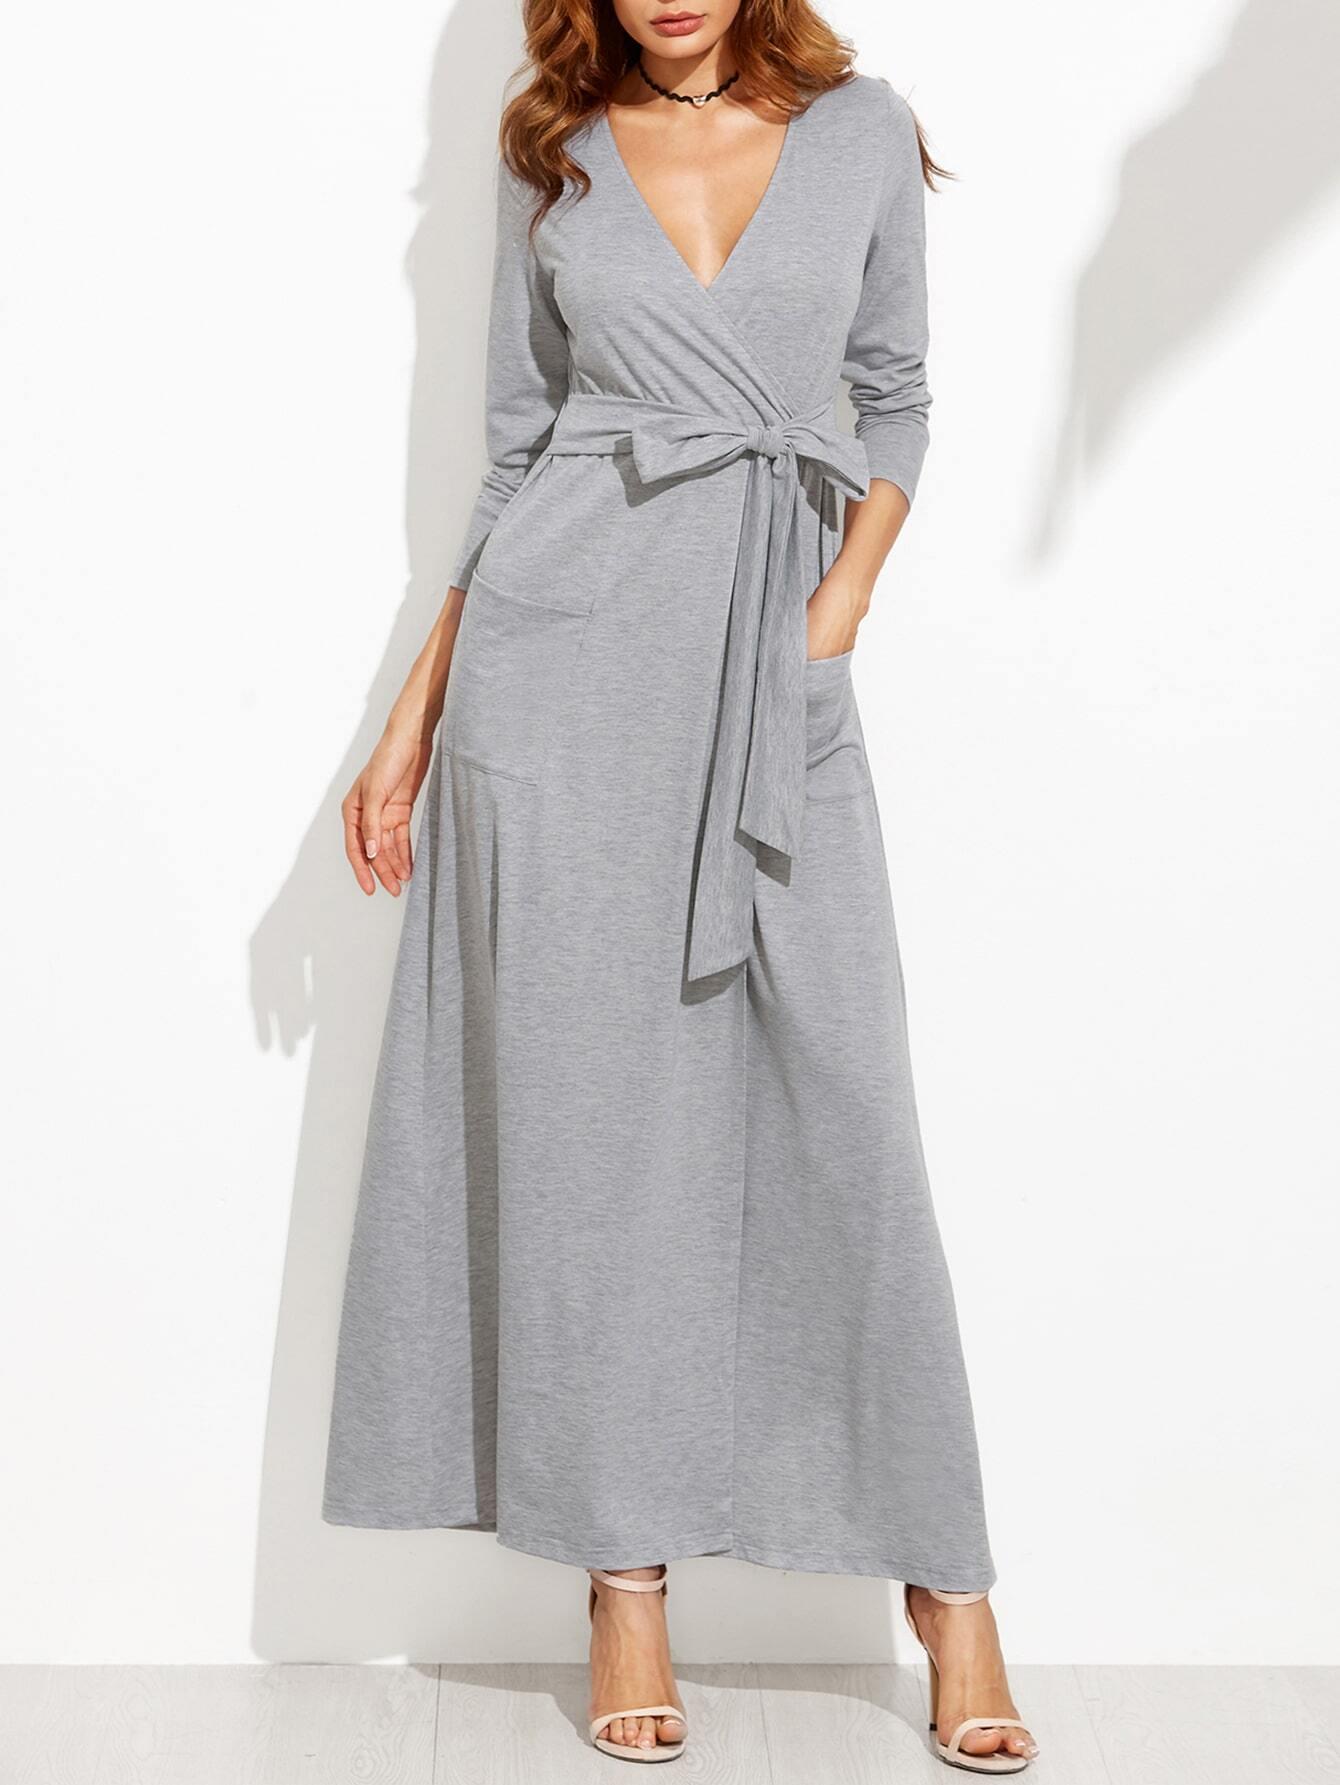 3e55c67ab37 Heather Grey Wrap Maxi Dress With Pockets EmmaCloth-Women Fast Fashion  Online